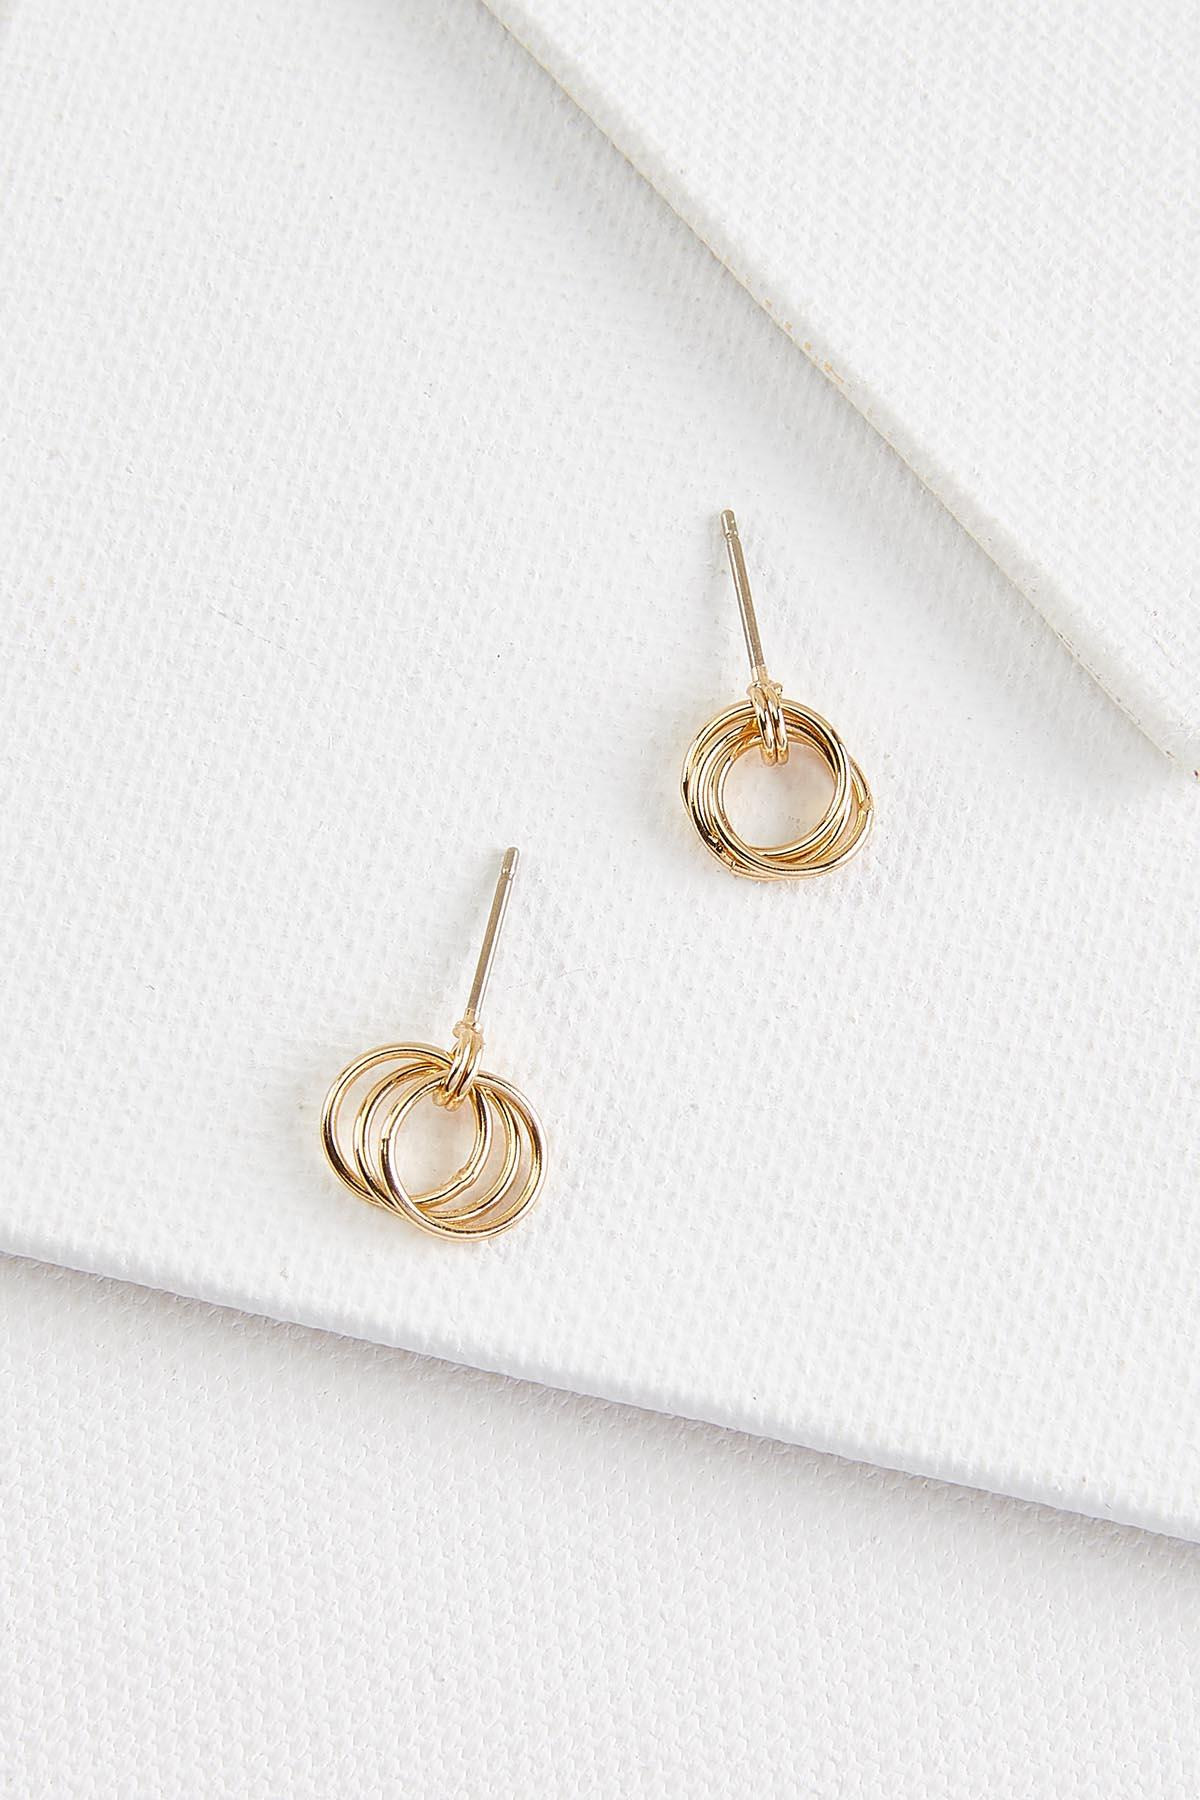 Dainty Circle Earrings